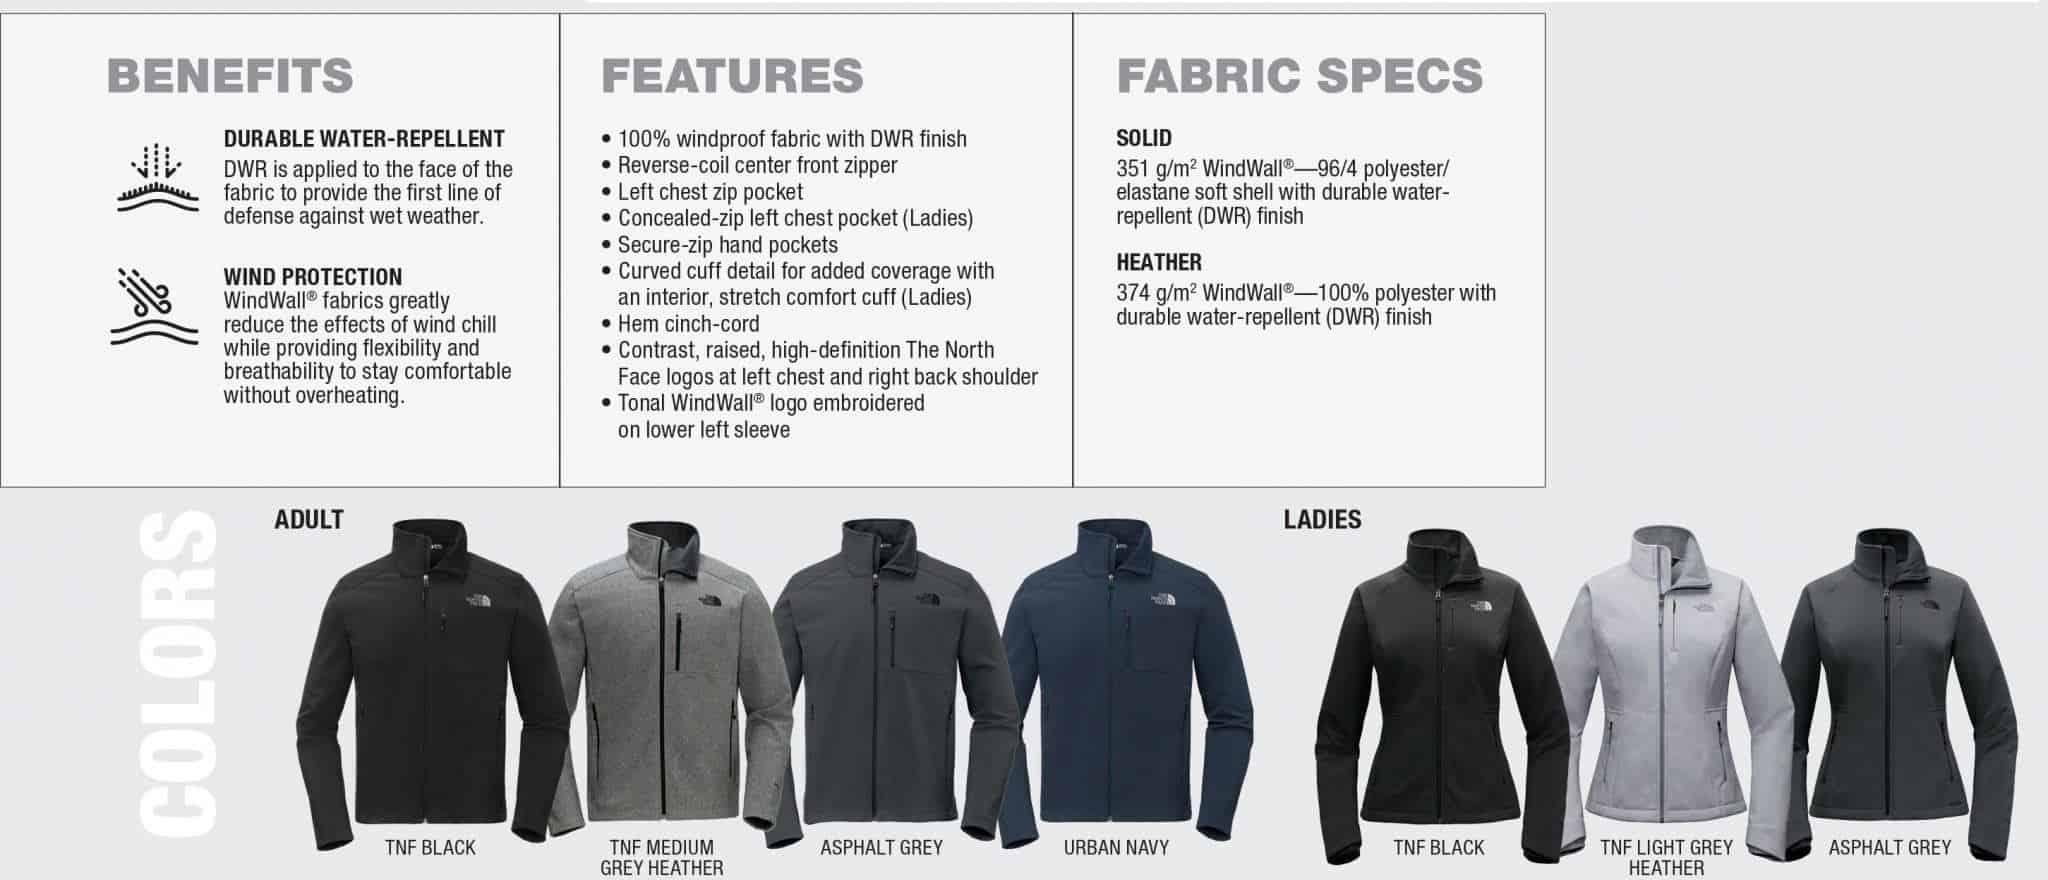 Custom North Face Jackets – WindWall Benefits